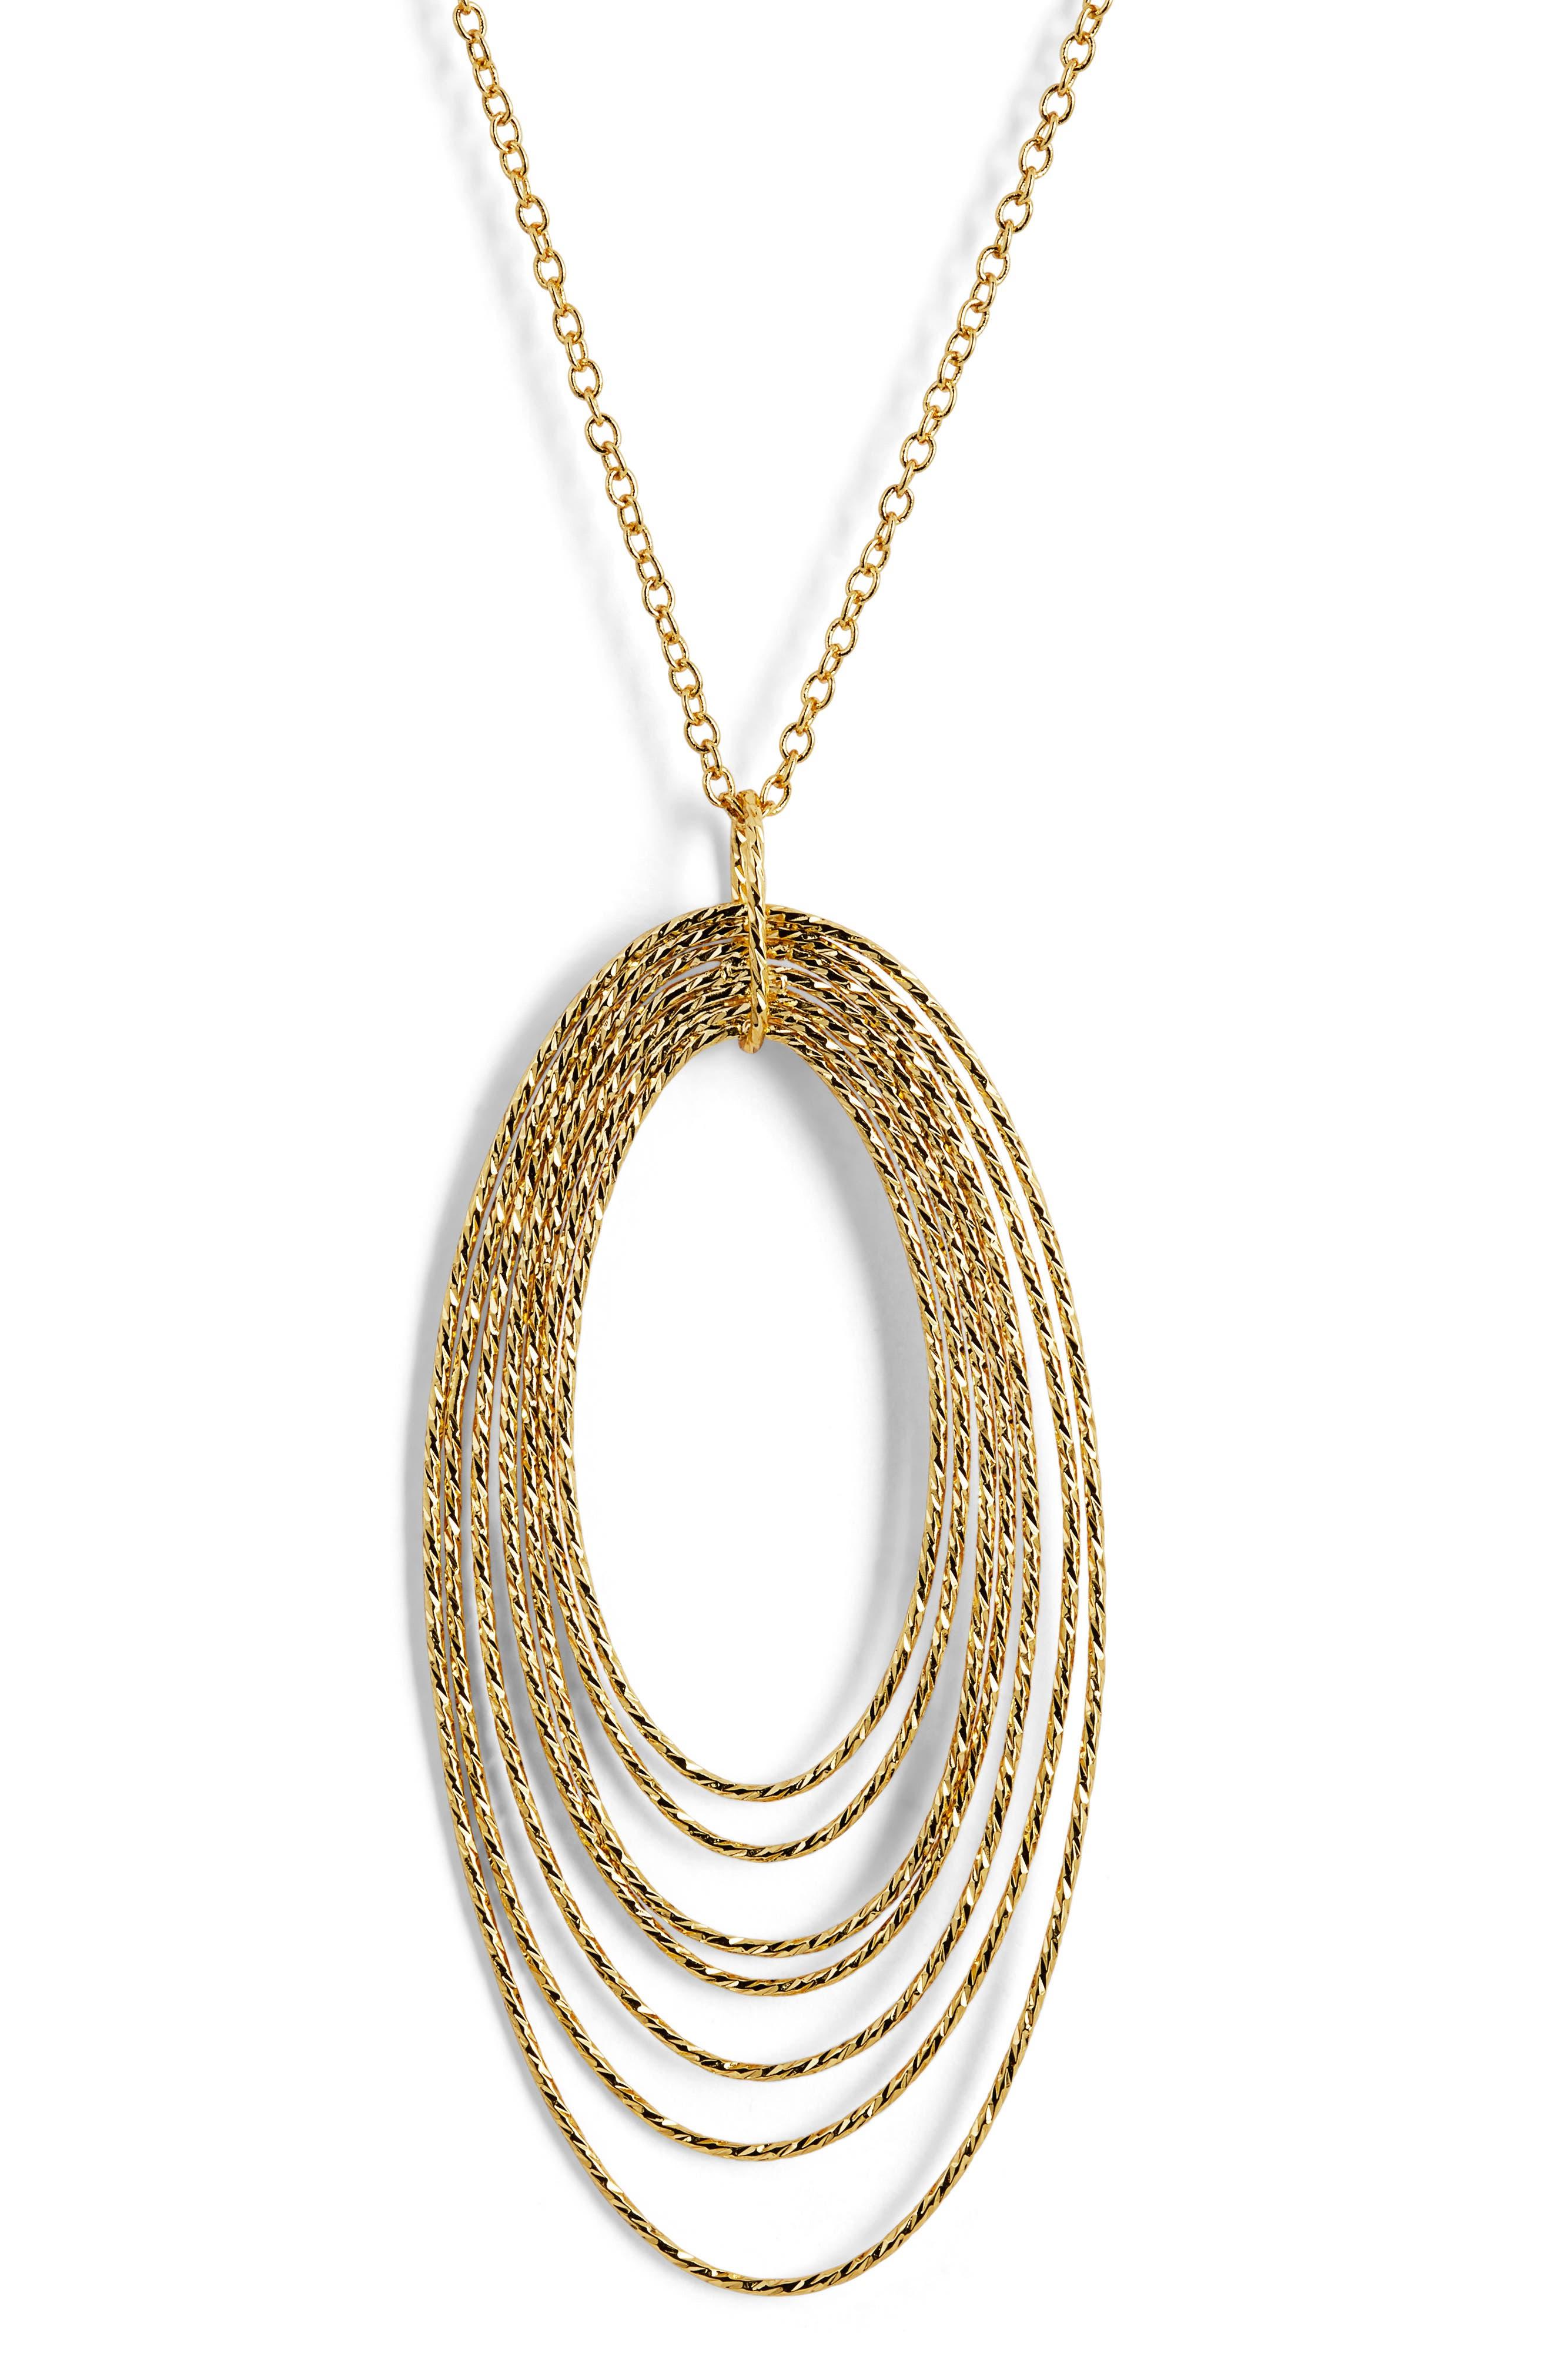 GORJANA,                             Presely Long Adjustable Pendant Necklace,                             Alternate thumbnail 2, color,                             GOLD